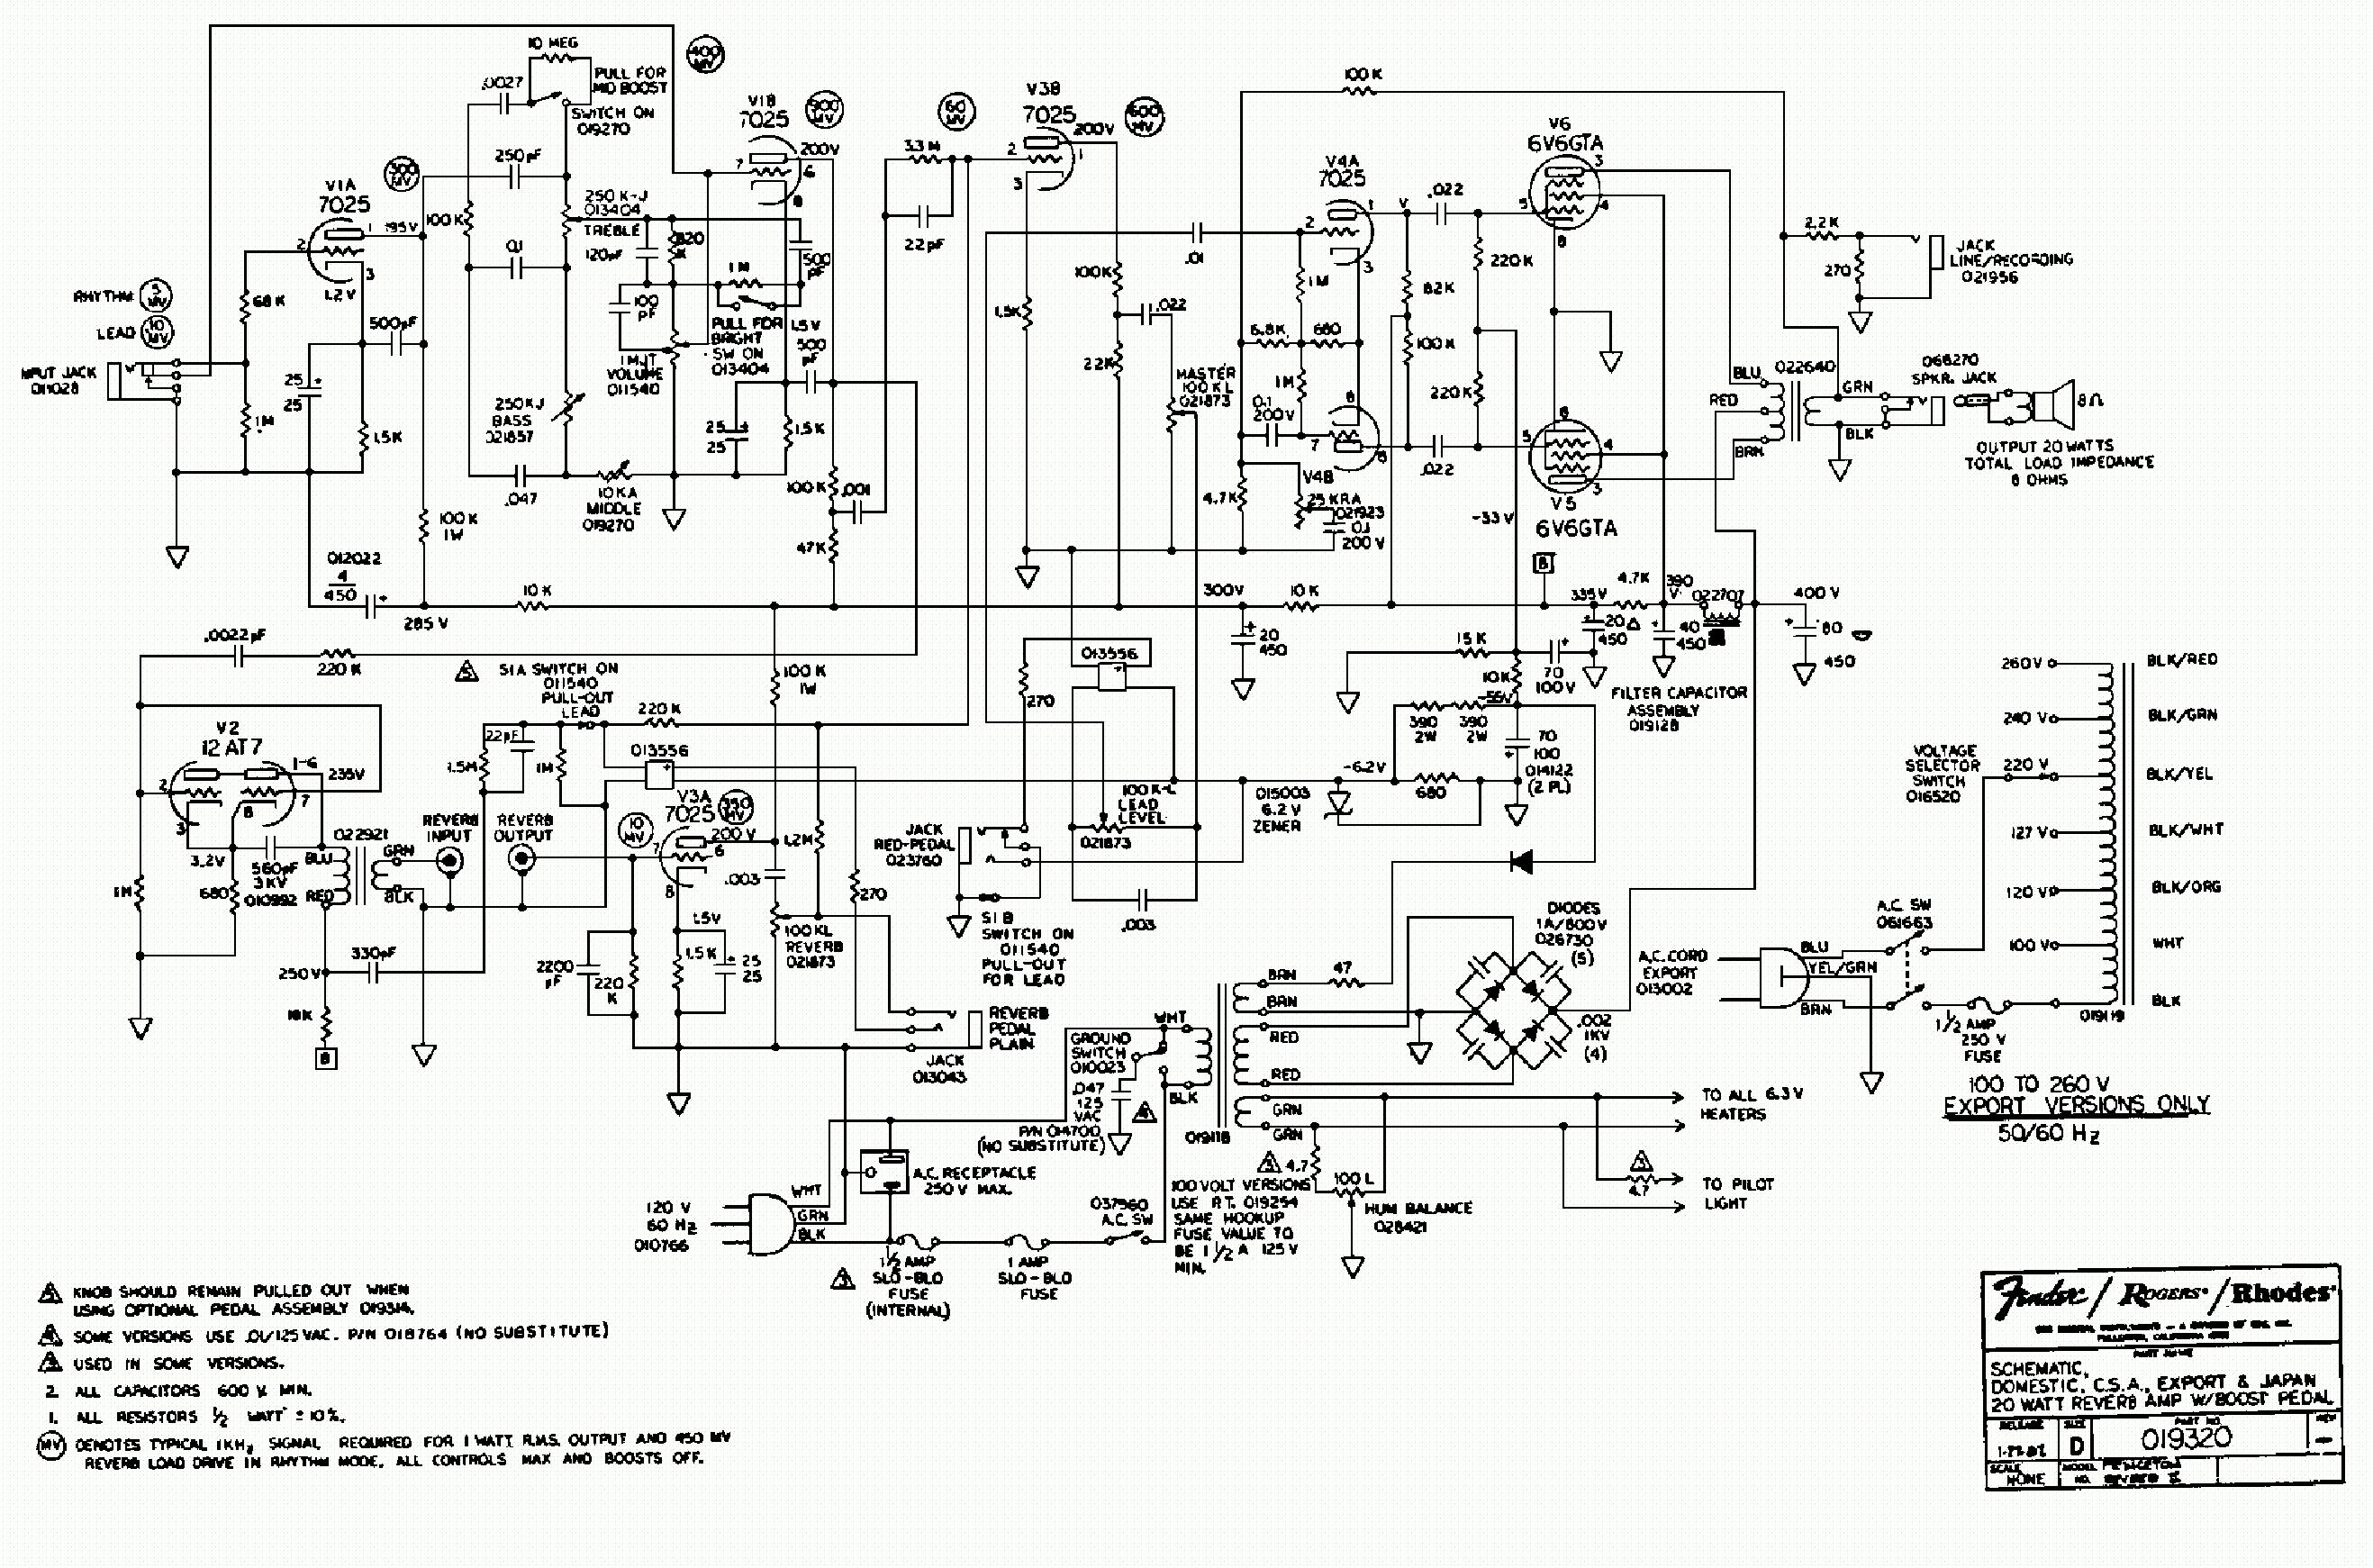 fender deluxe reverb amp circuit